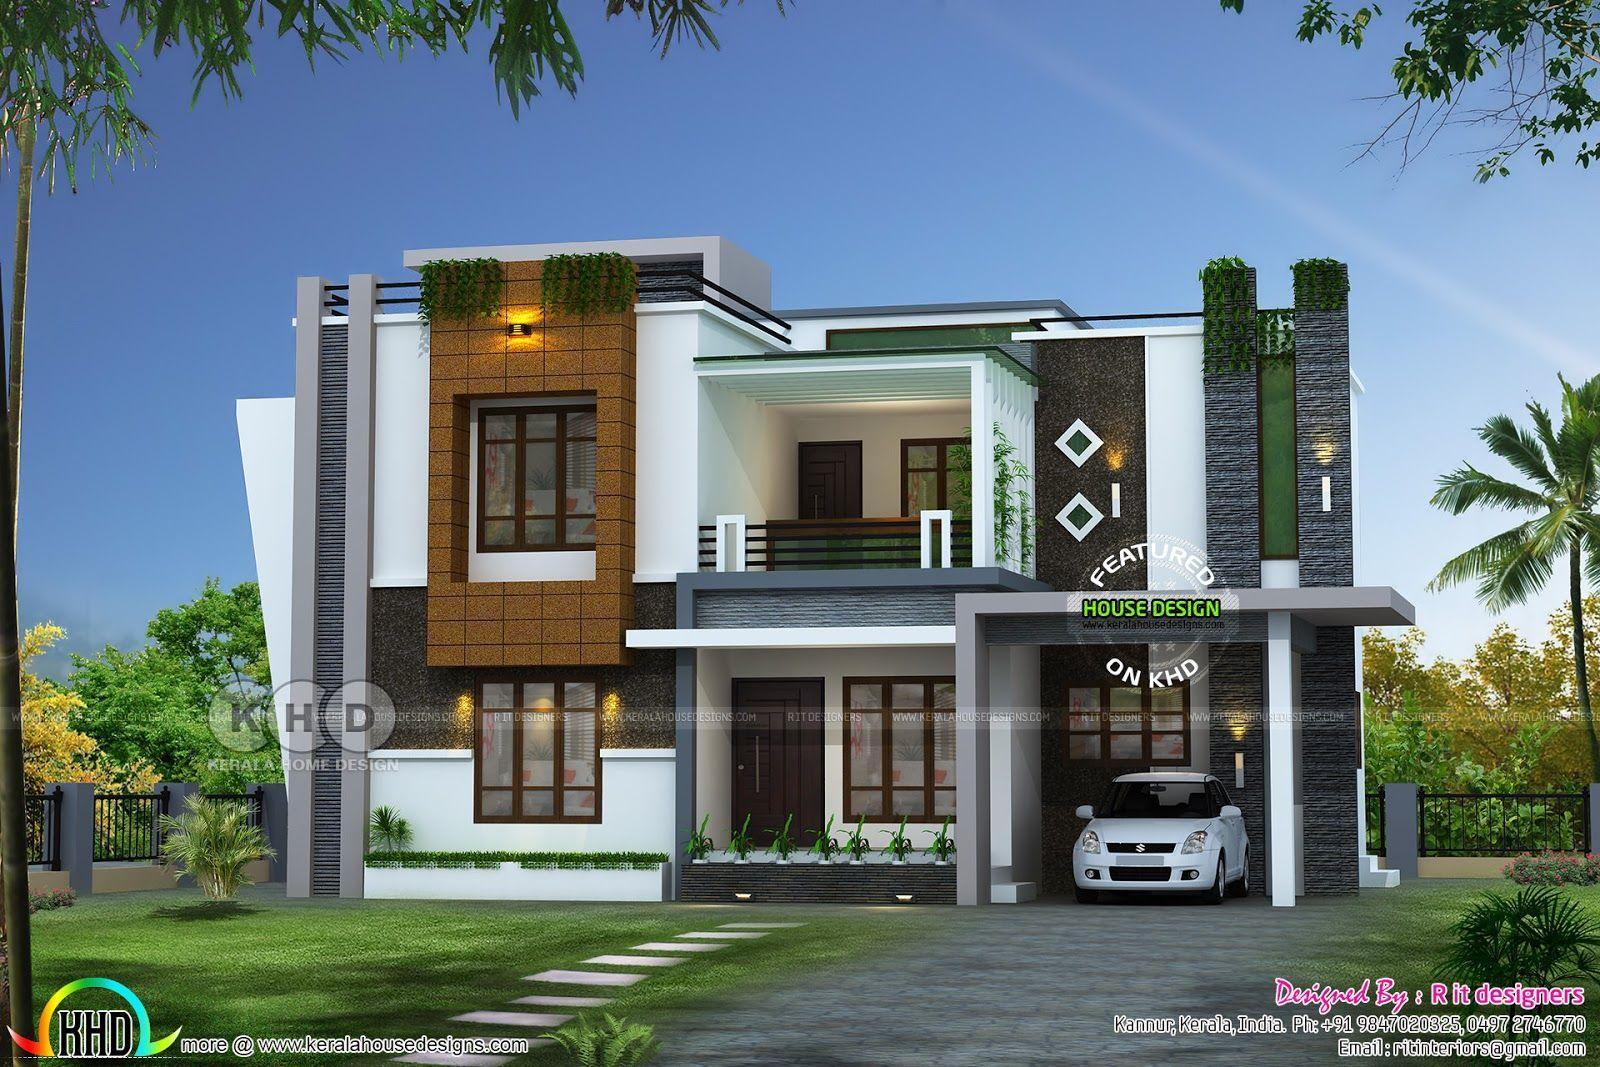 2352 Sq Ft Awesome Contemporary Kerala Home Design Arsitektur Modern Desain Eksterior Desain Eksterior Rumah